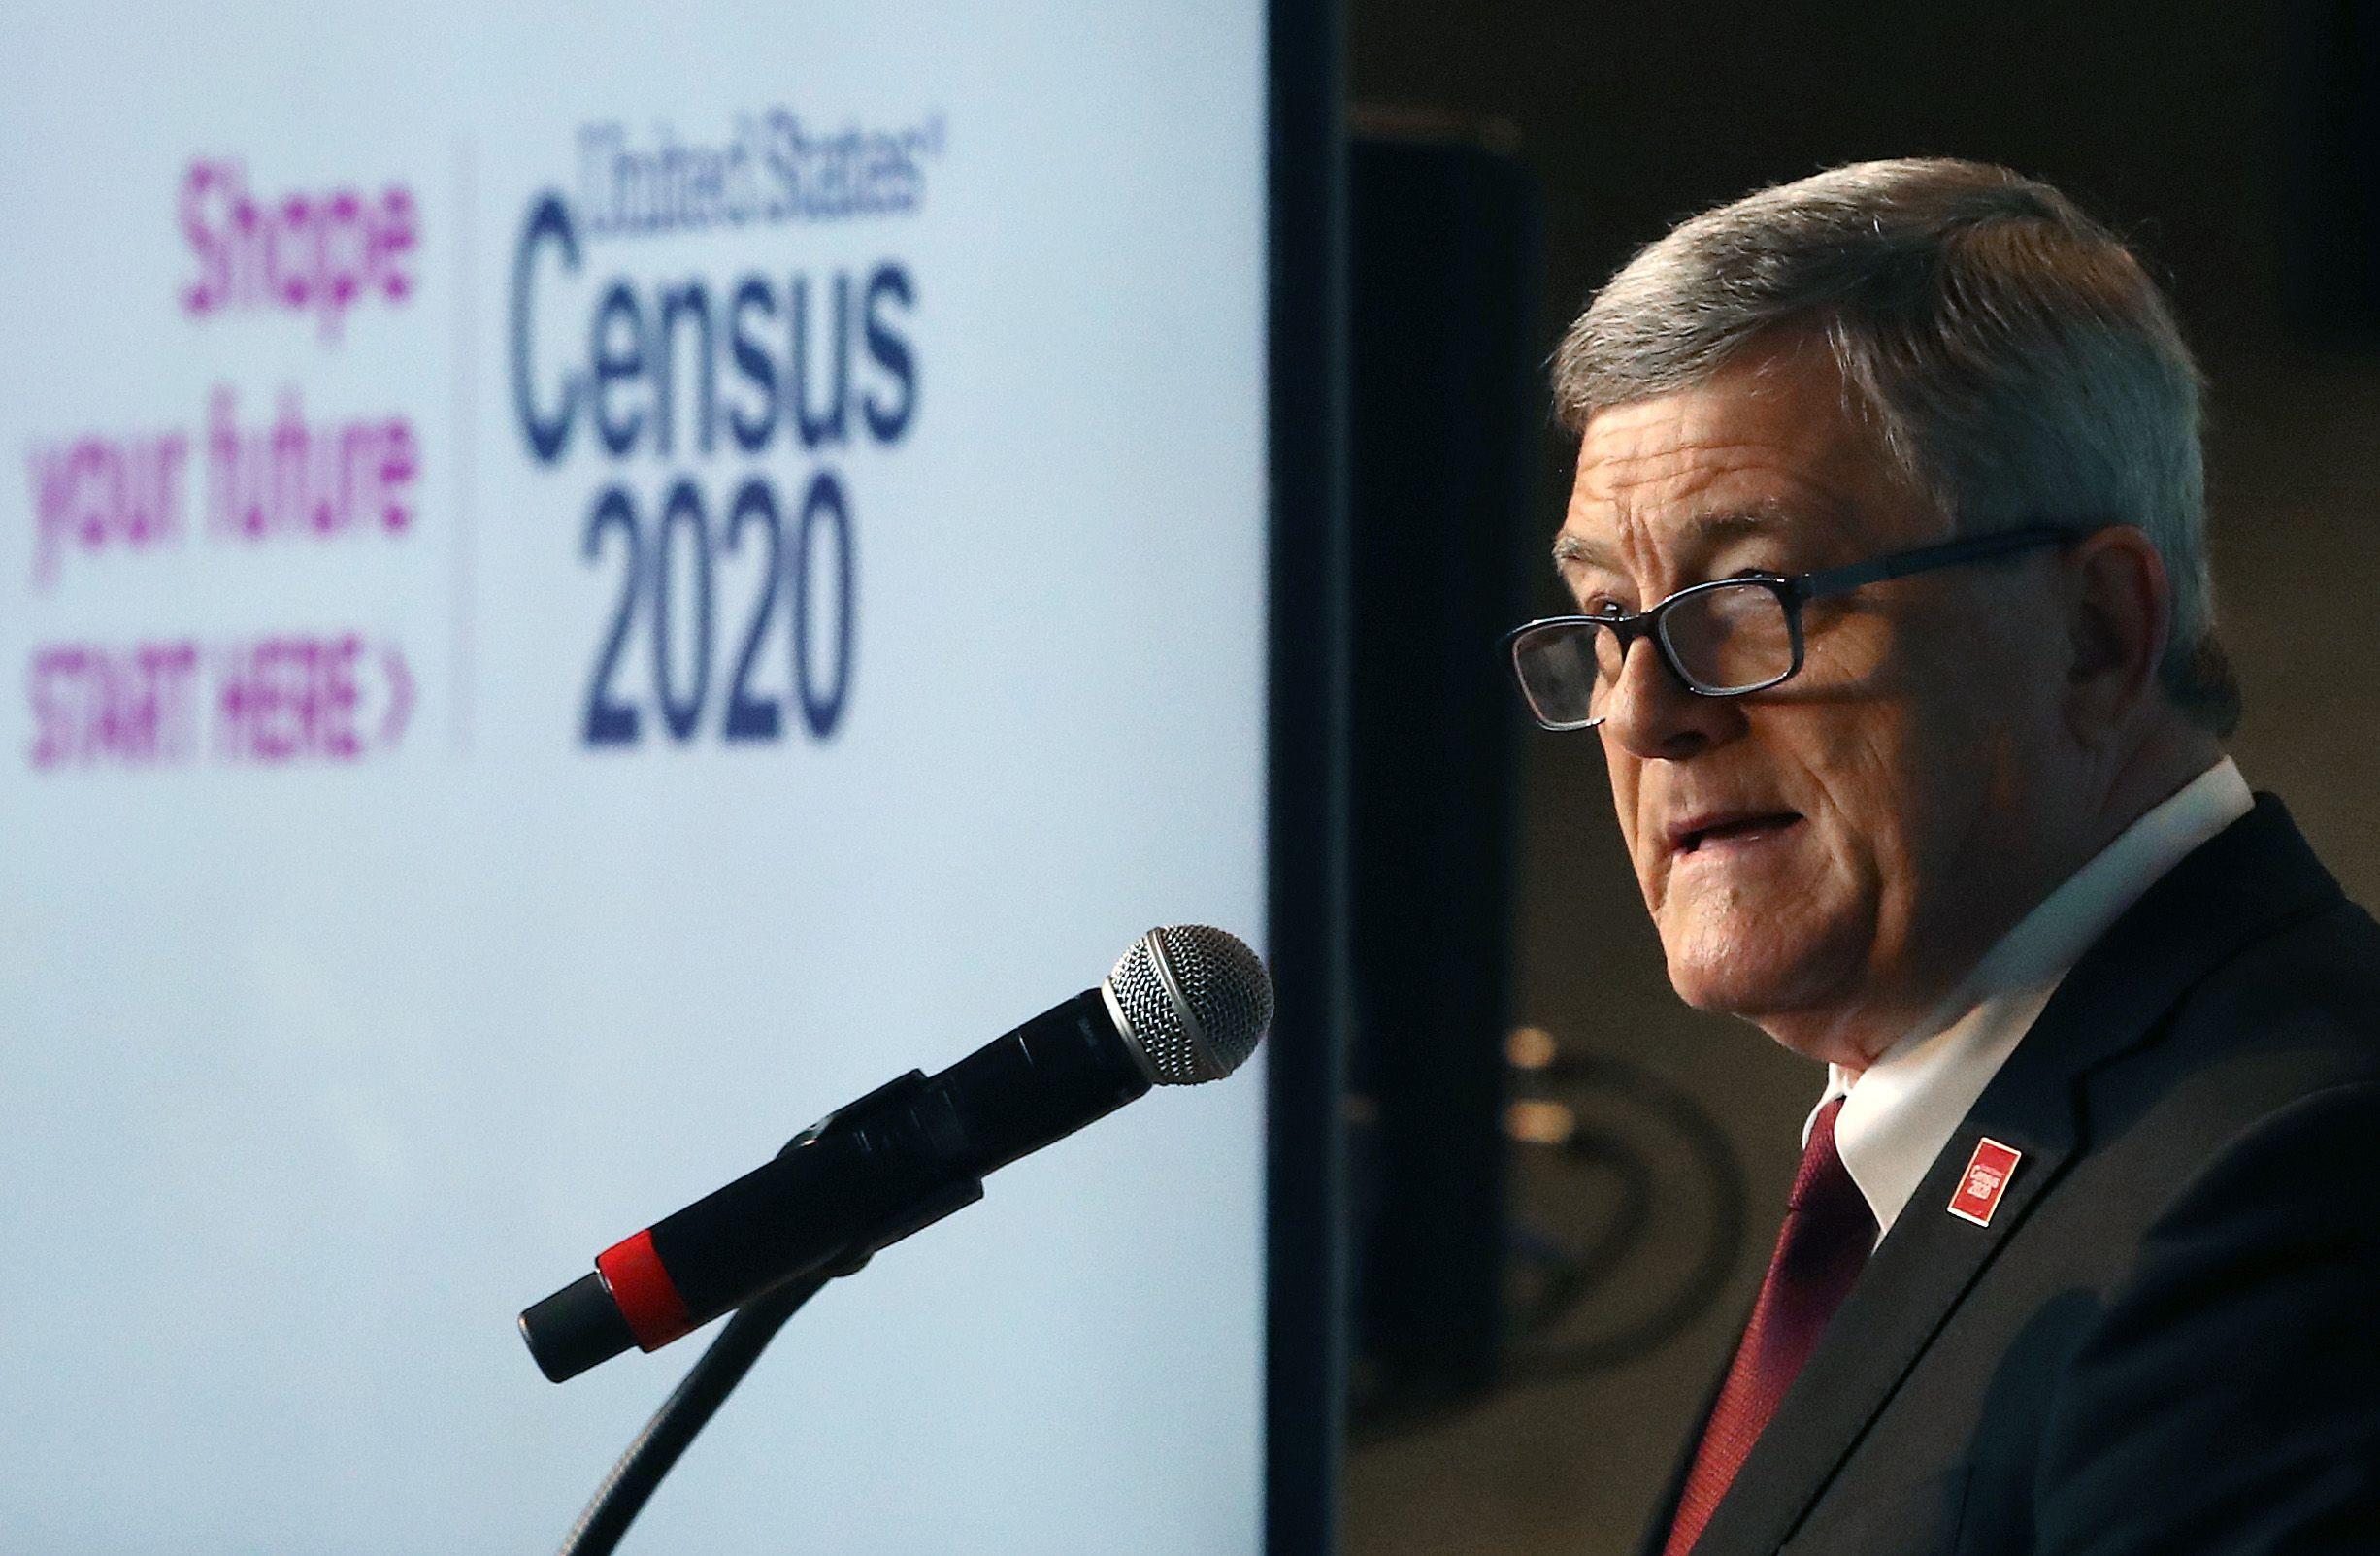 Shift to digital census raises fear of Iowa-like breakdown - Axios